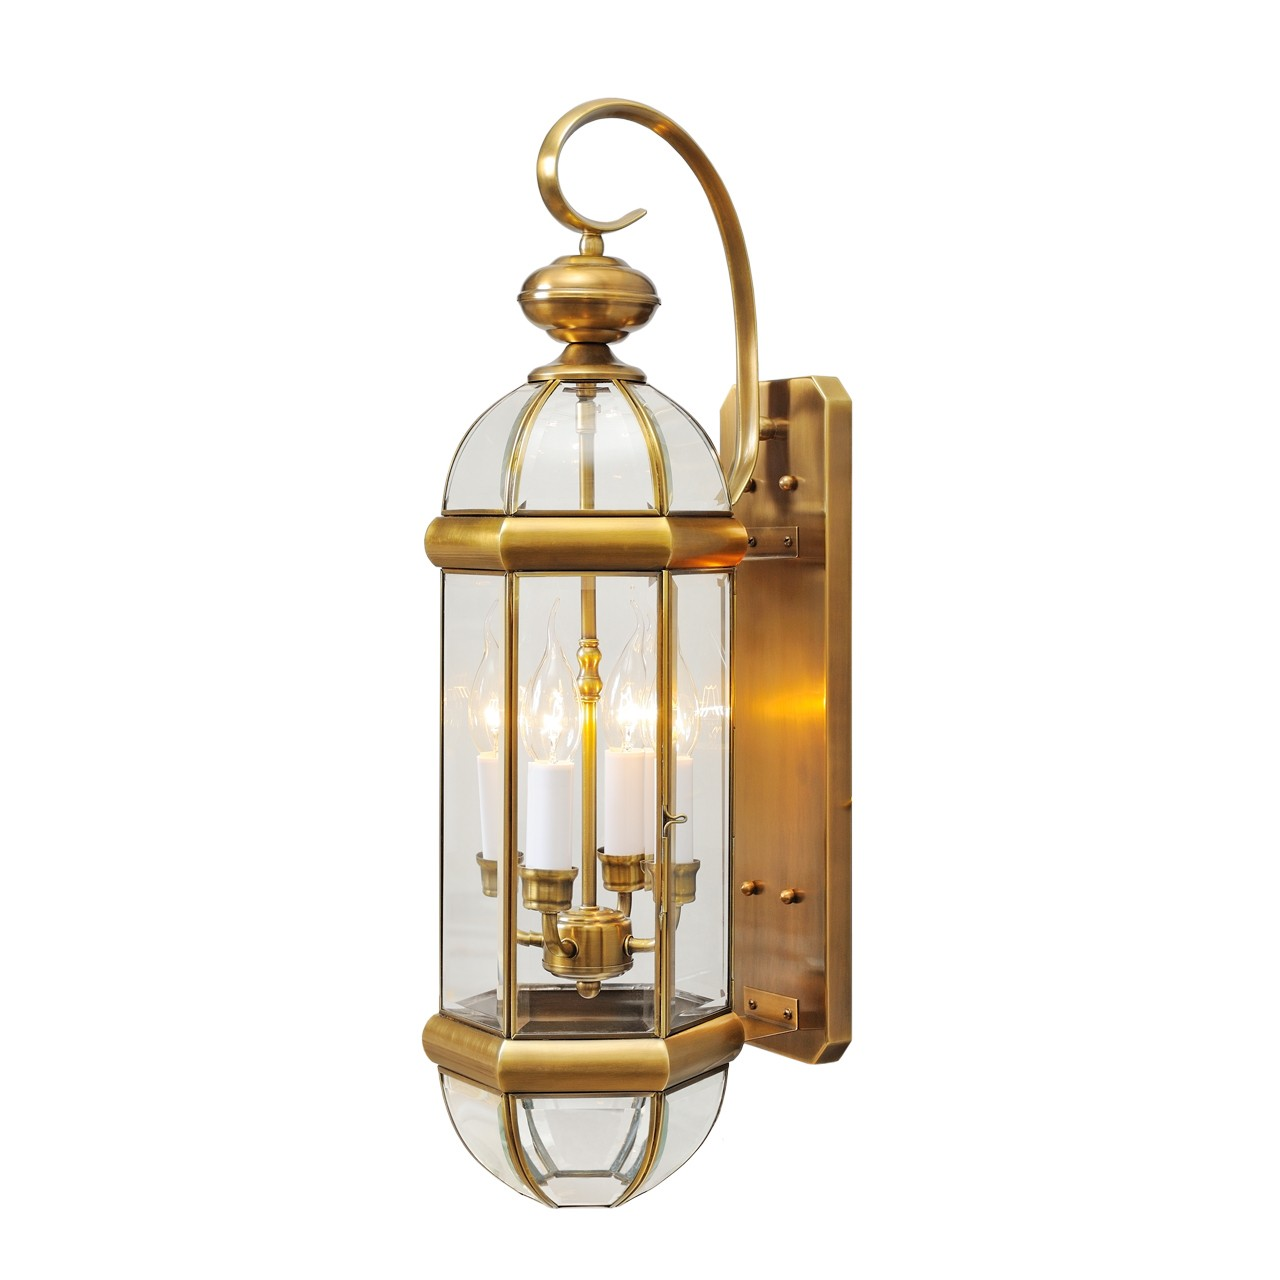 Уличный светильник Chiaro 802020504